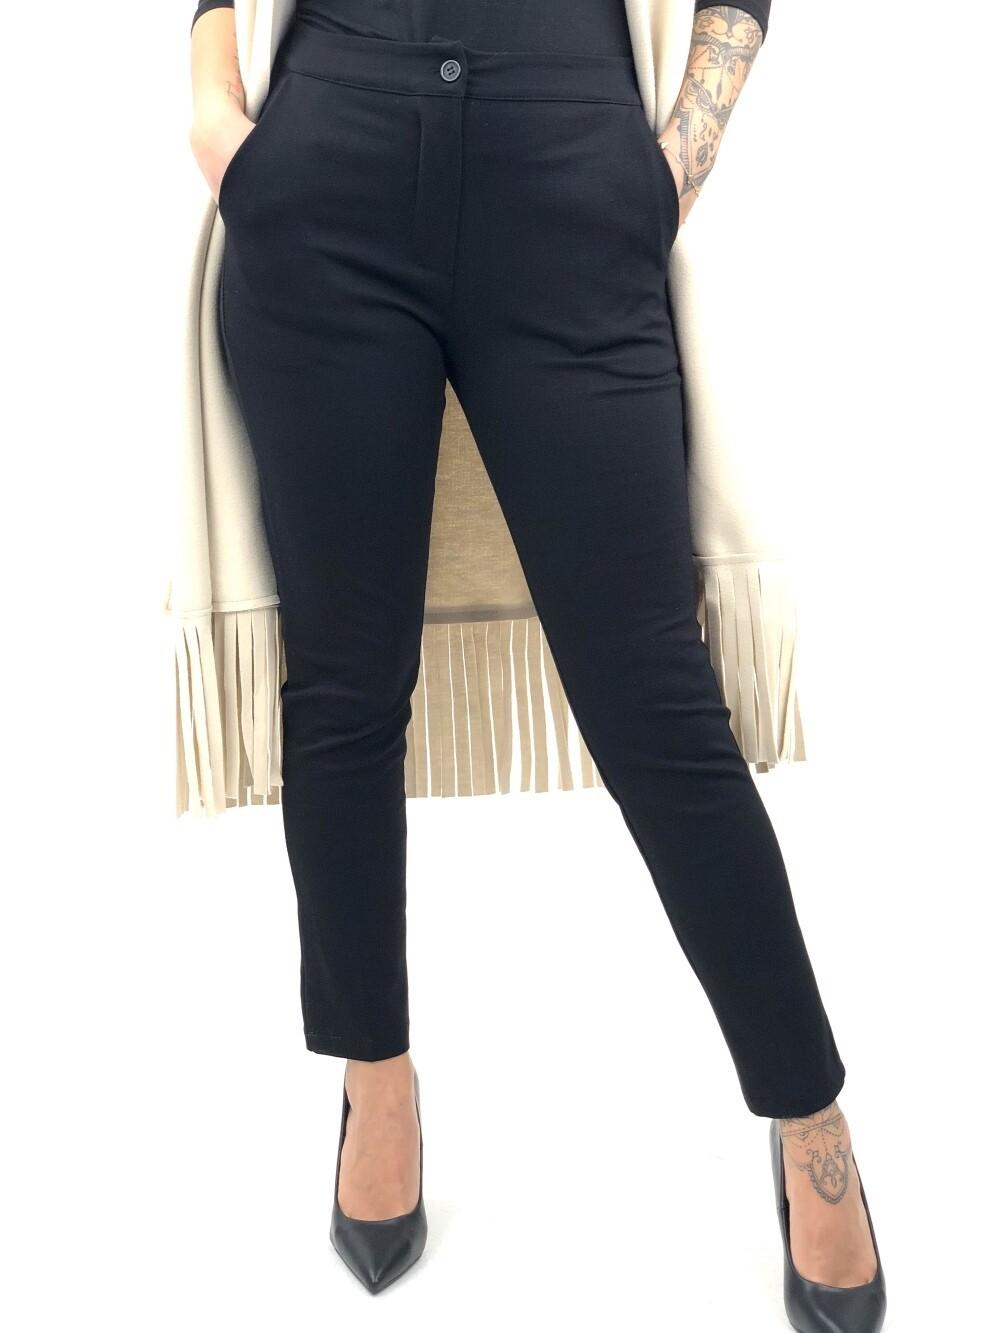 Pantalone lungo aderente - SRNYY9799